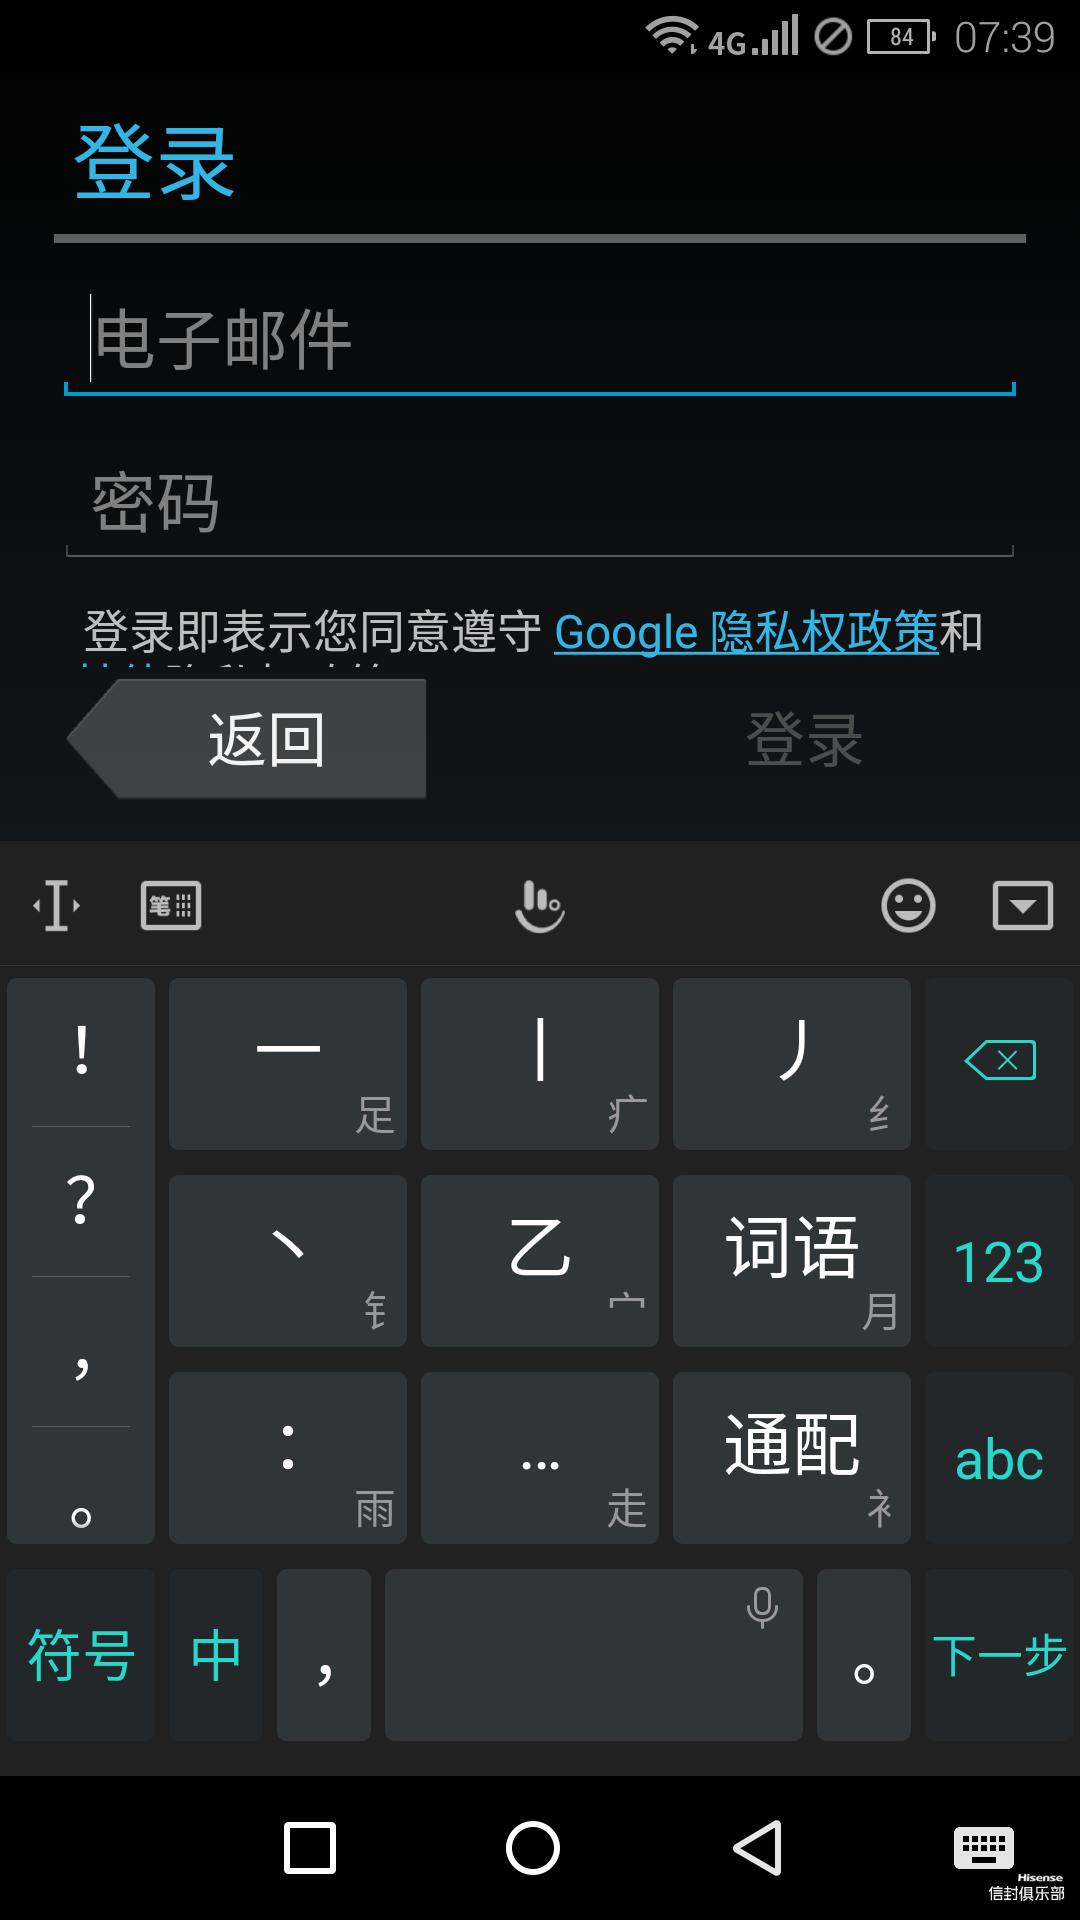 Screenshot_20170703-073946_Google 帐户管理器.png